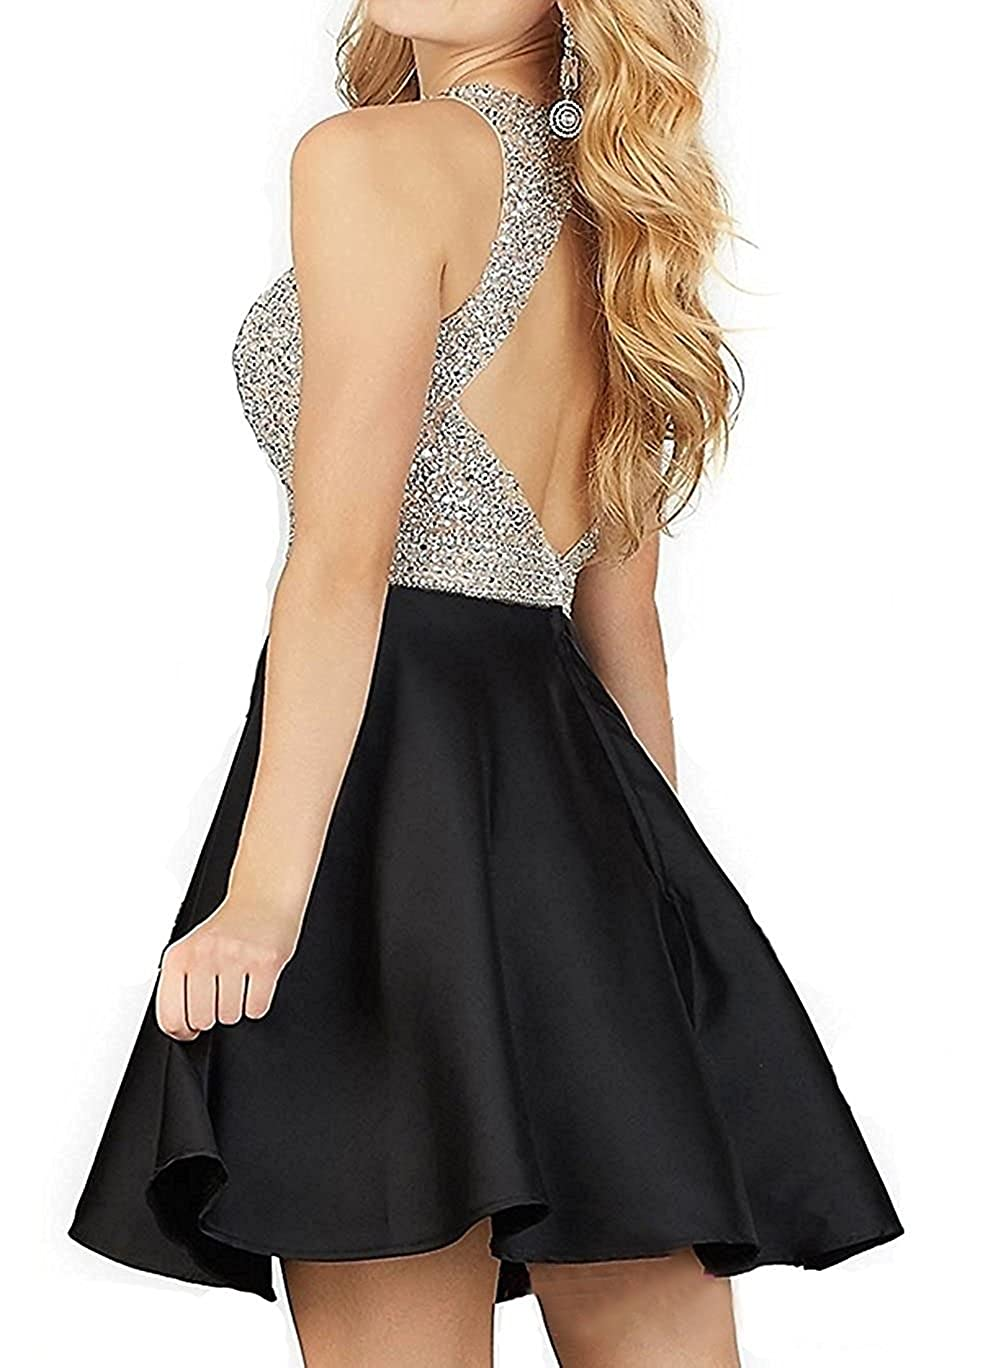 Steady Black 2017 Elegant Cocktail Dresses Sheath Cap Sleeves Short Mini Crystals Open Back Homecoming Dresses Weddings & Events